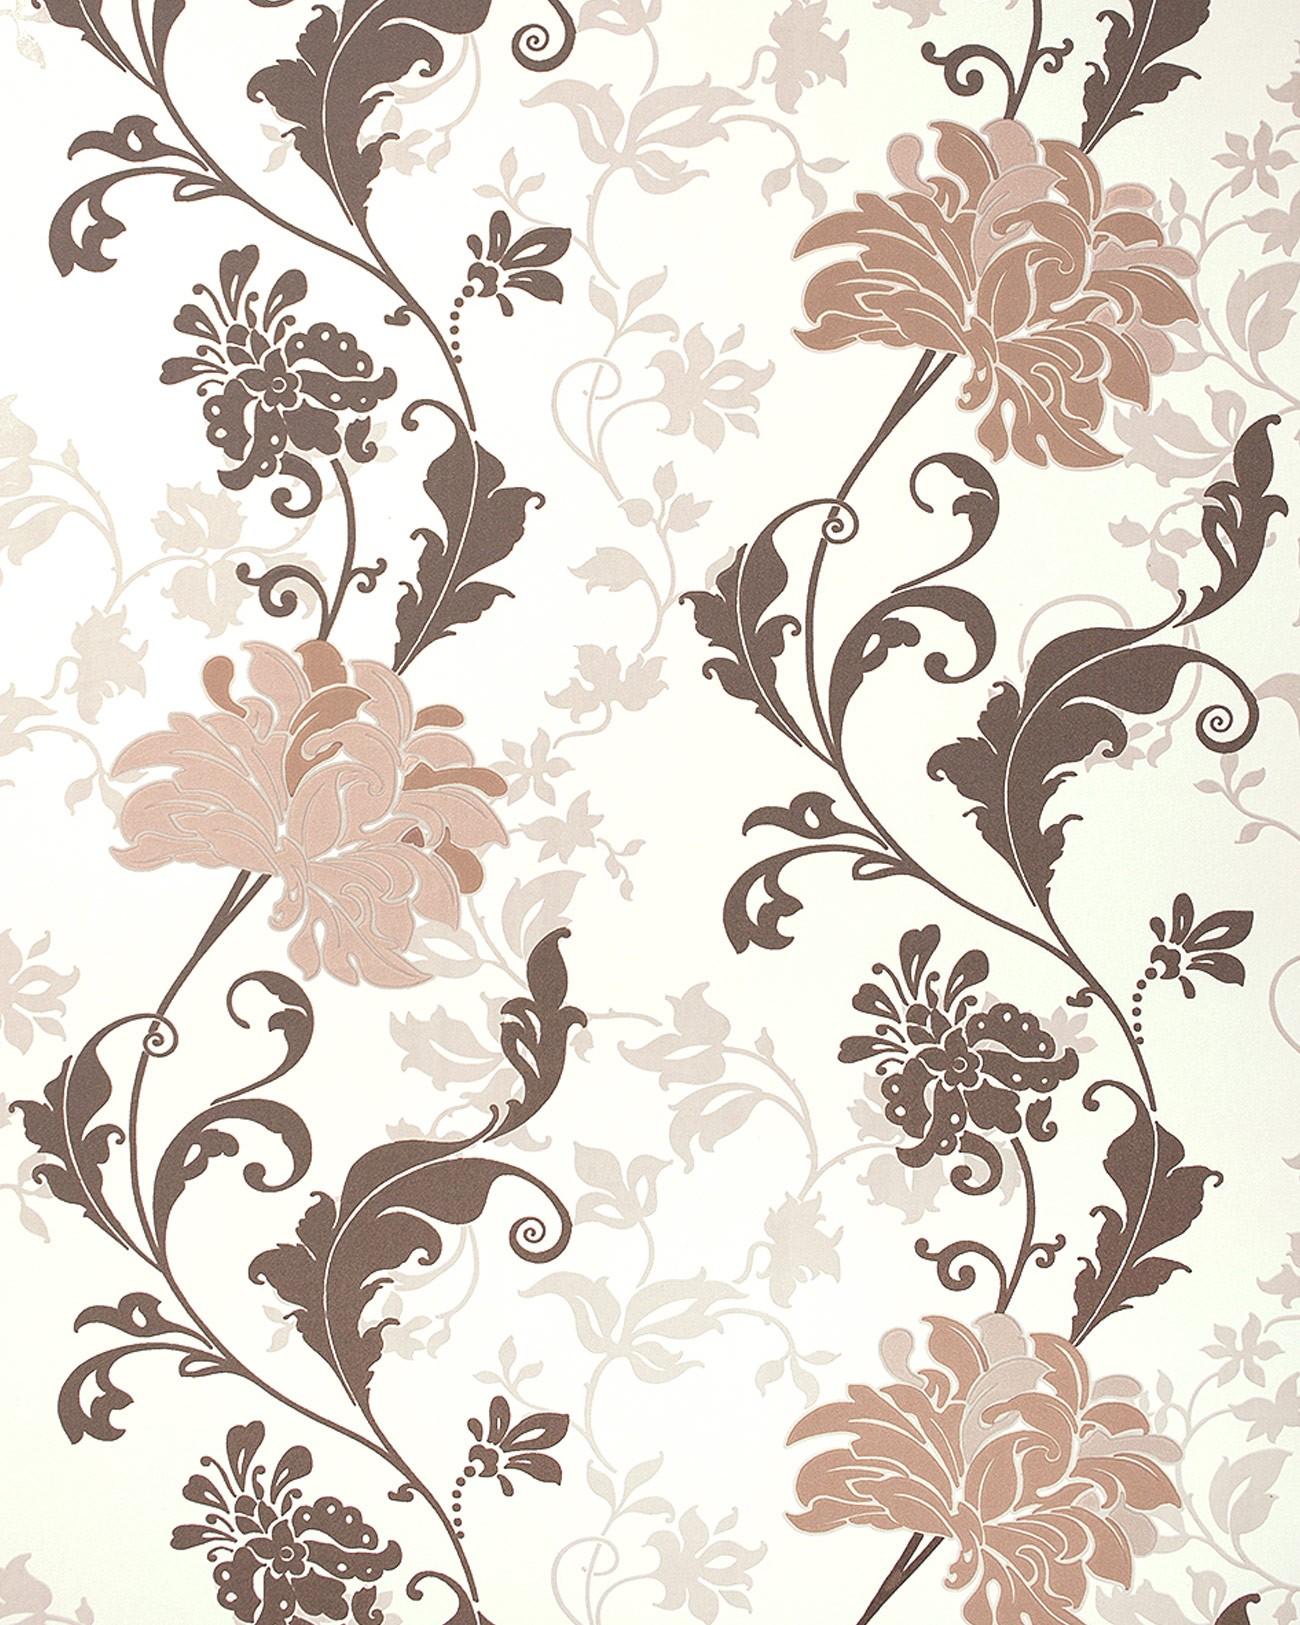 edem 833 23 edles florales muster blumen tapete braun beige hellbraun 70 cm original edem braun. Black Bedroom Furniture Sets. Home Design Ideas